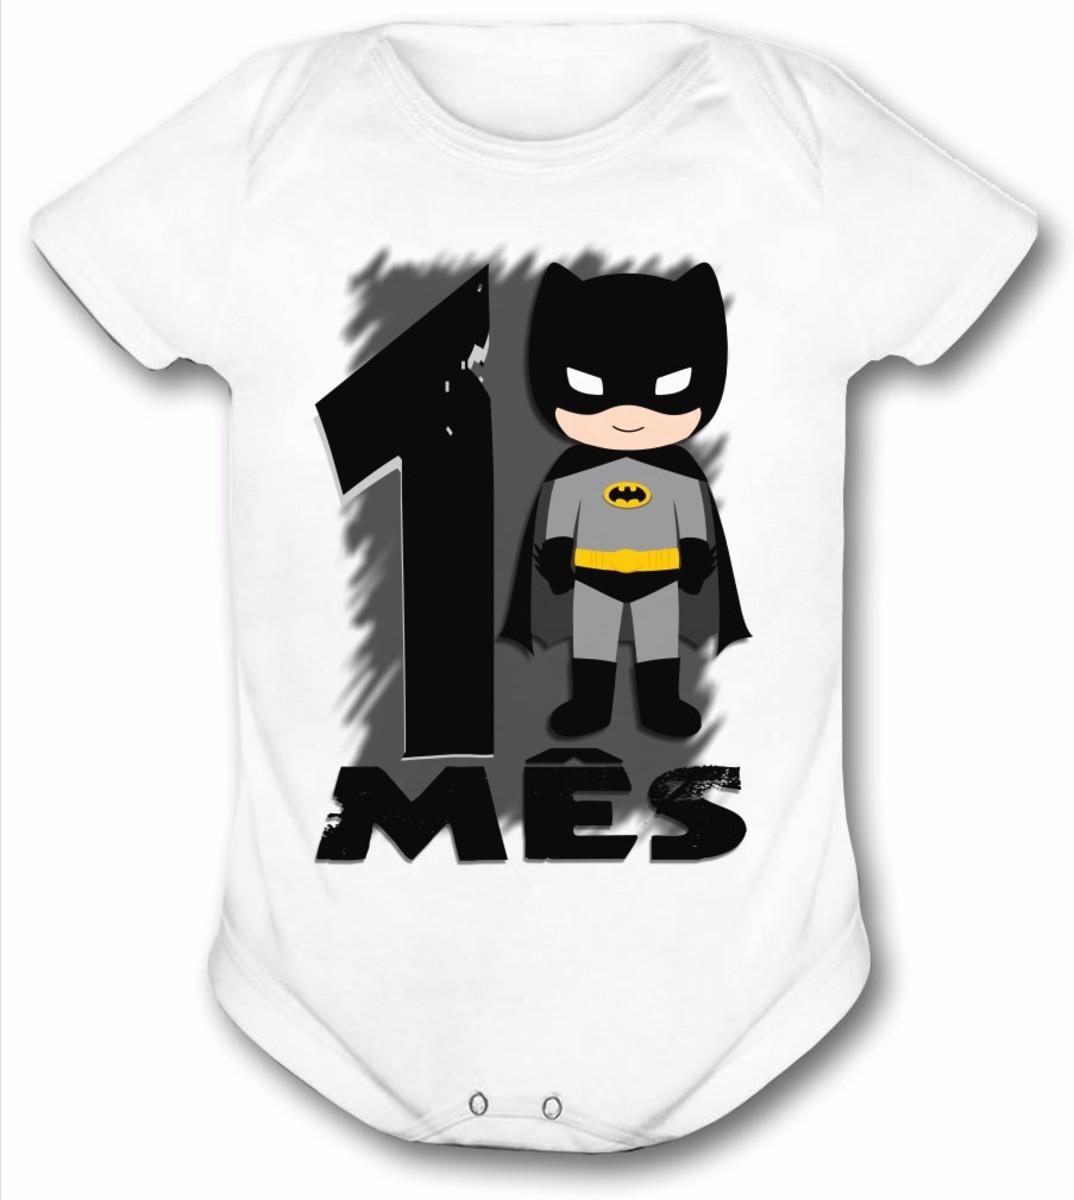 Body Batman bebe mesversario heróis no Elo7  5636d85503d